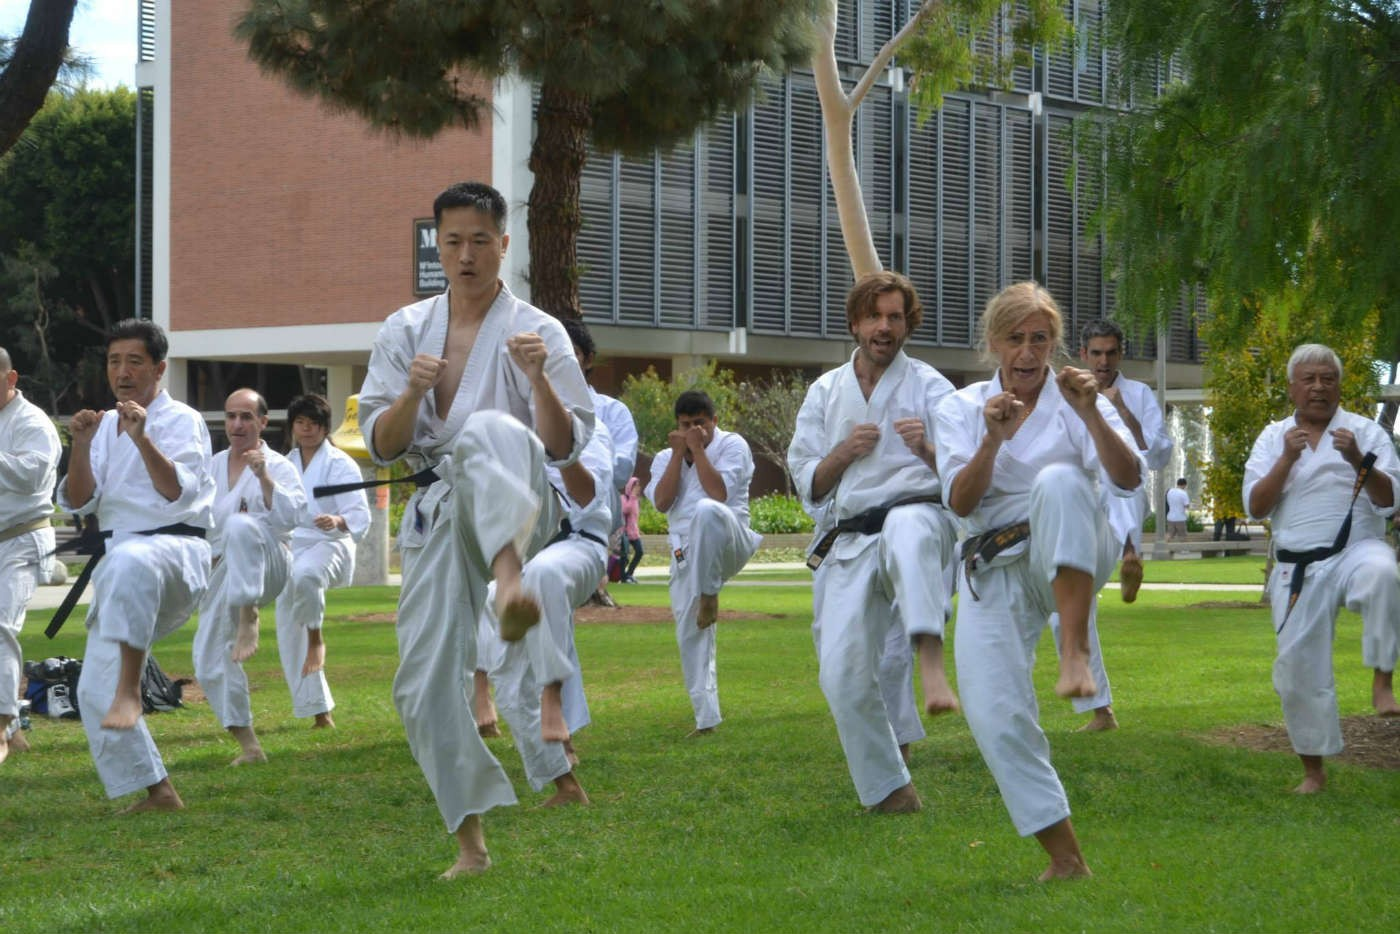 CSULB Shotokan Karate Club 2014 karate demonstration